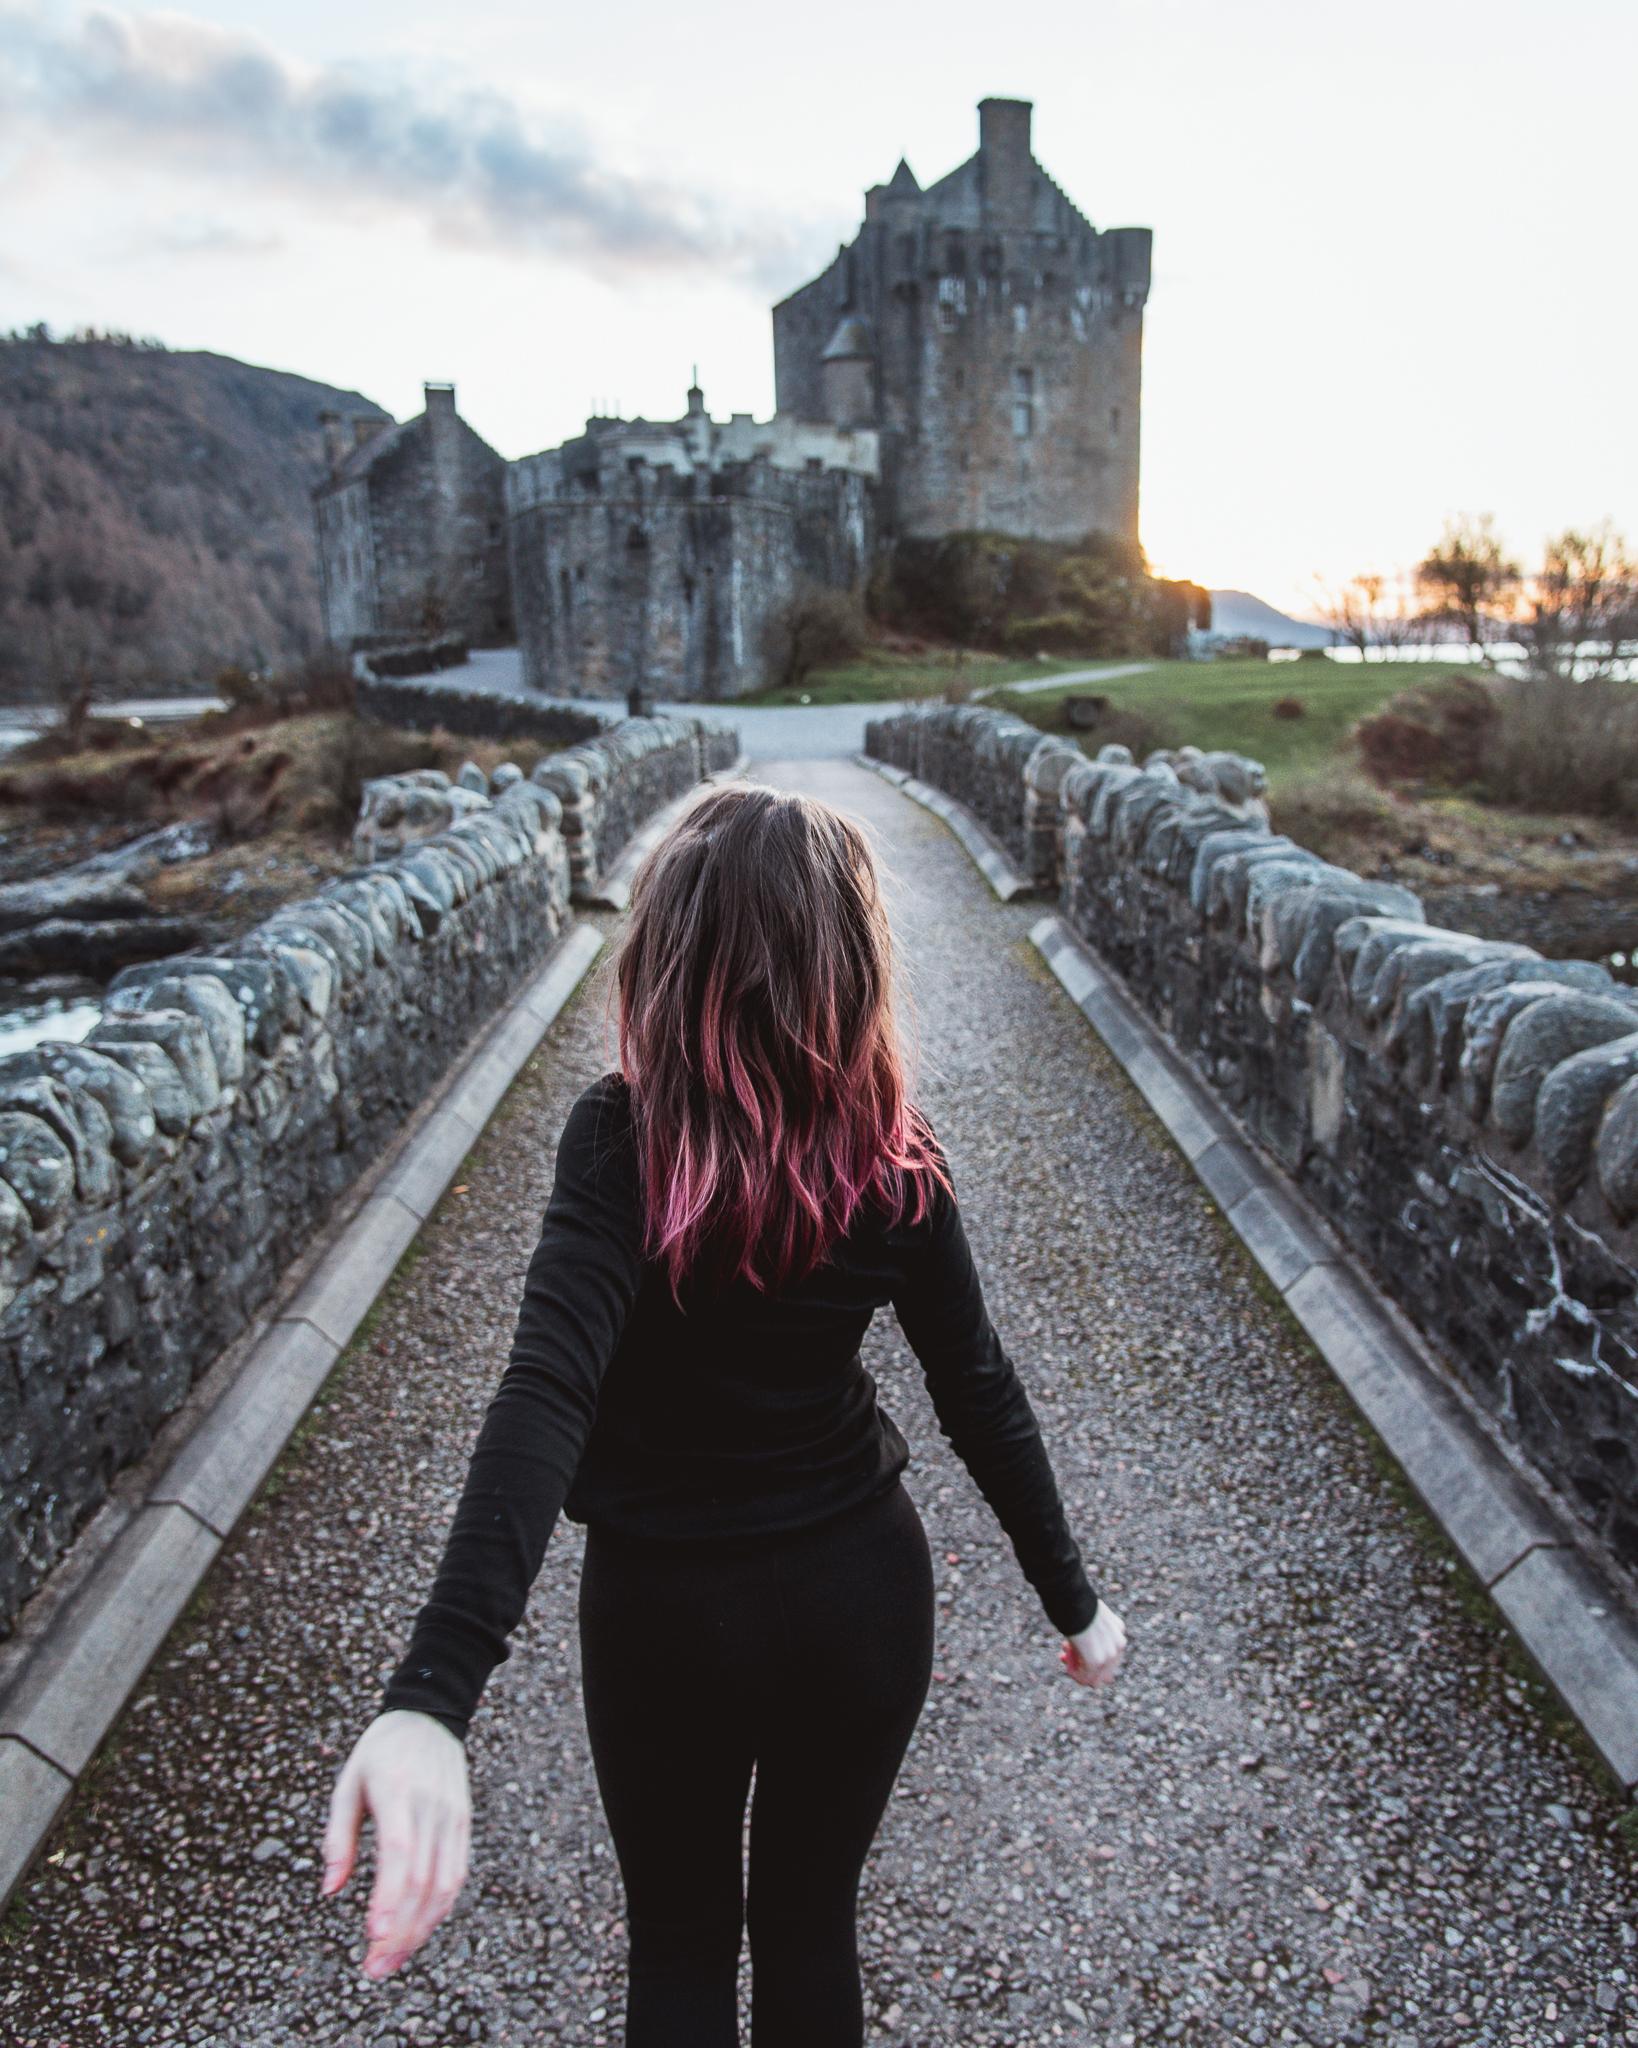 eilean donan, castle, scotland, instagram, instagrammable, ig